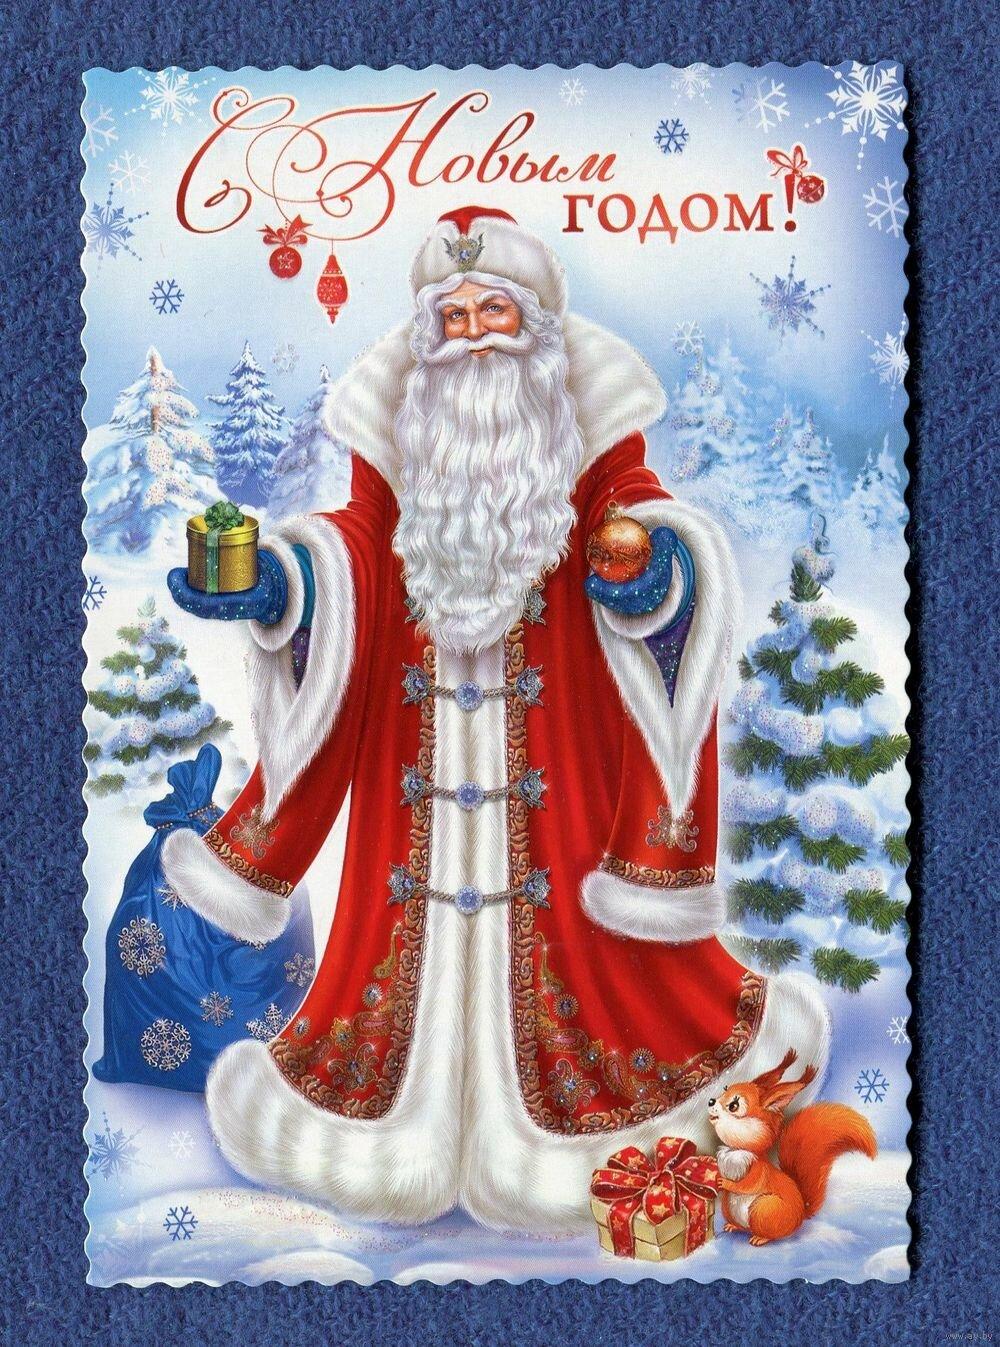 Дед мороз и снегурочка на новогодних открытках